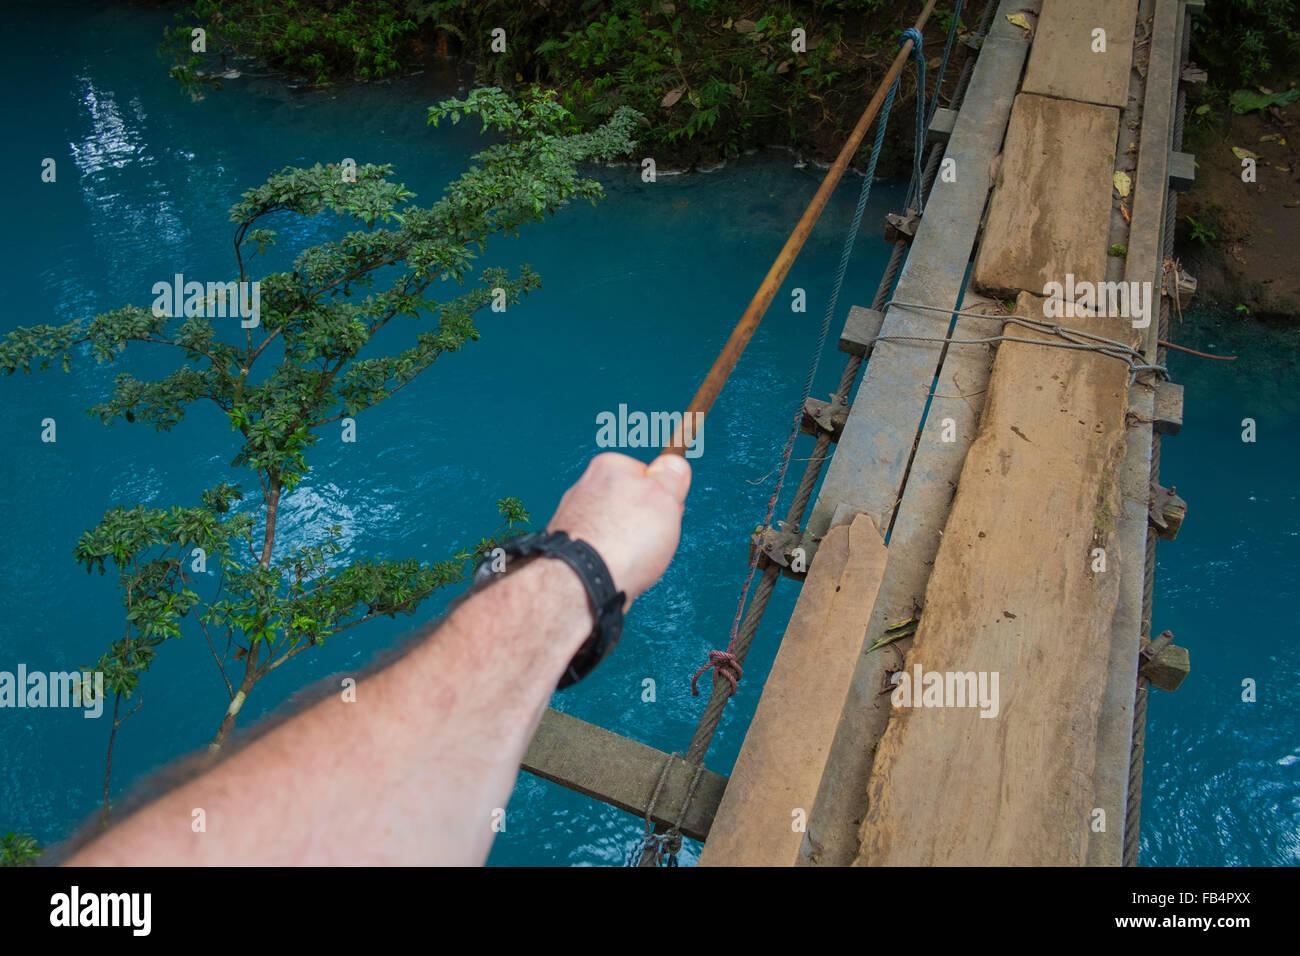 A tourist walks over a rickety bridge that crosses the milky blue water of the Rio Celeste, Costa Rica Stock Photo